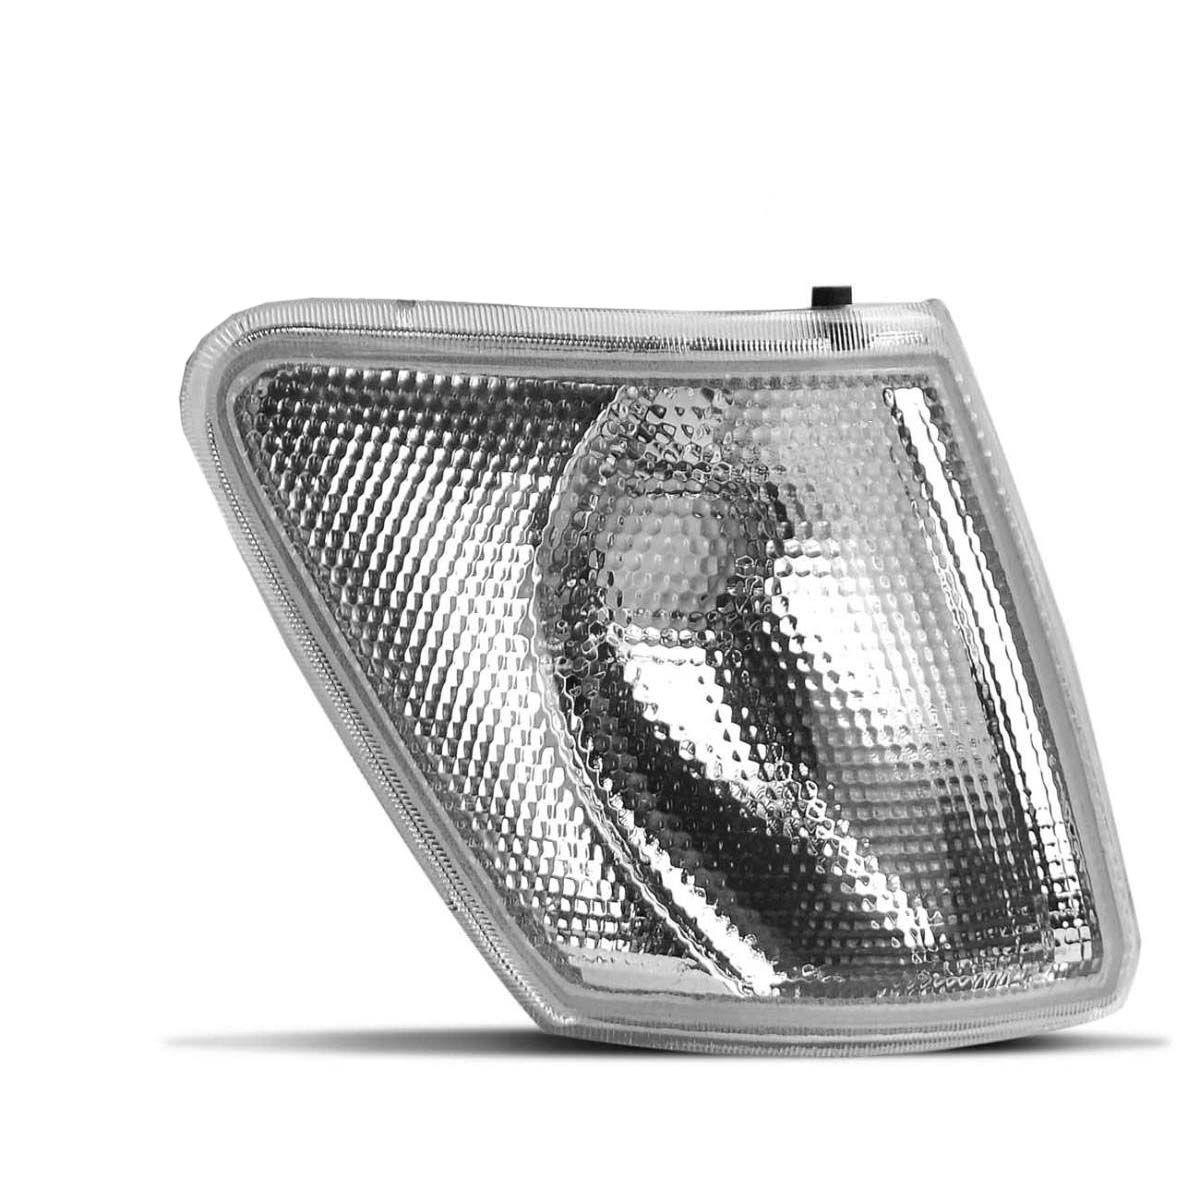 Lanterna dianteira Pisca Fiesta 93 94 95 Branca cristal